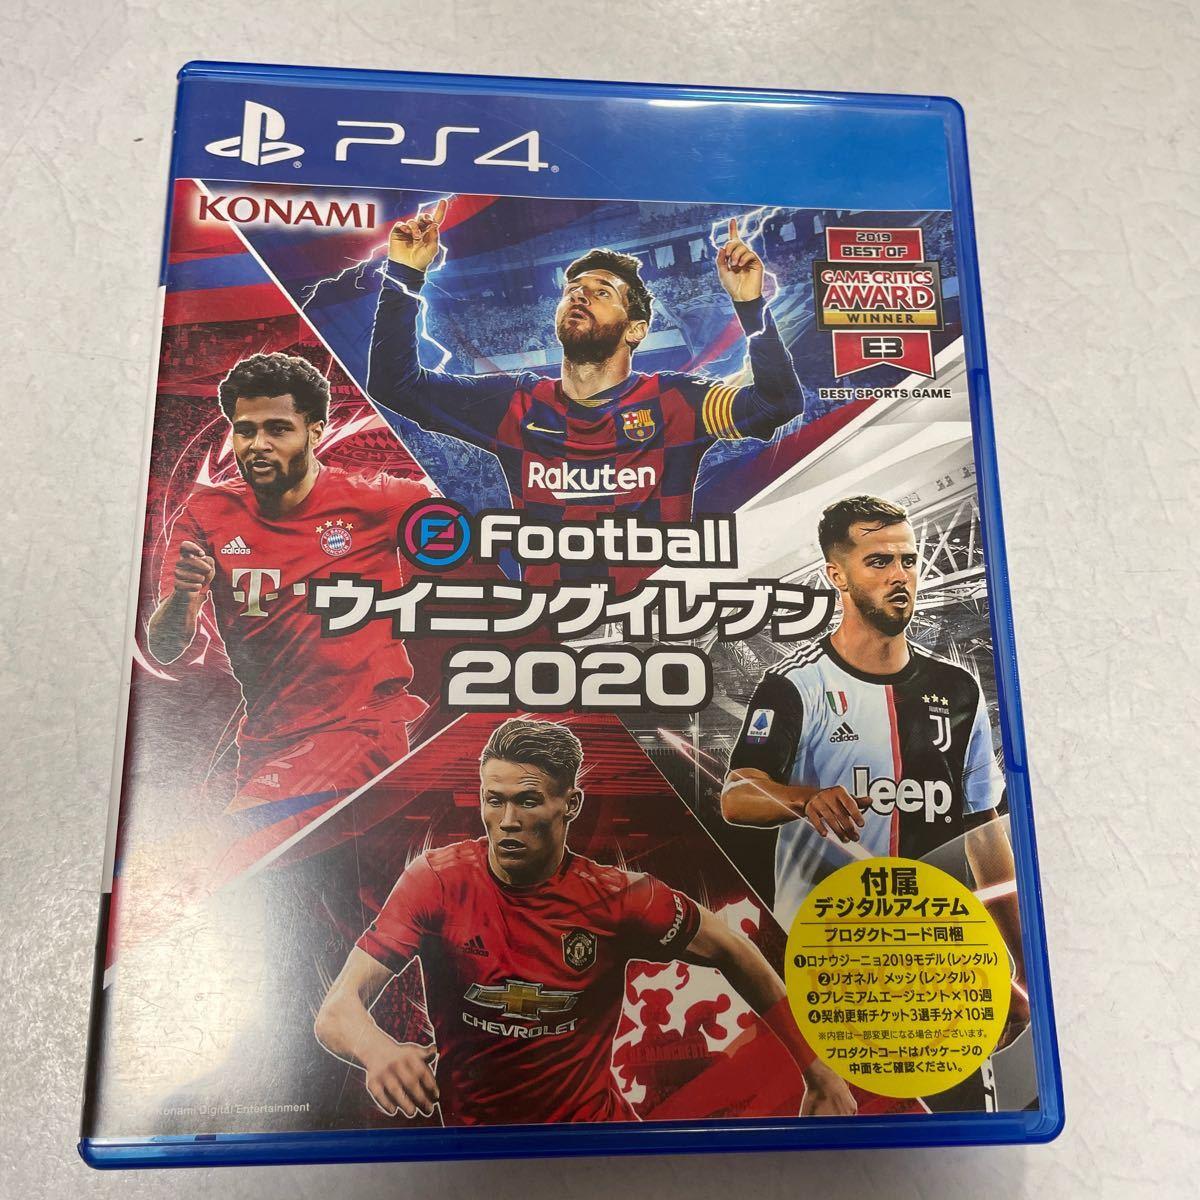 【PS4】 eFootball ウイニングイレブン 2020